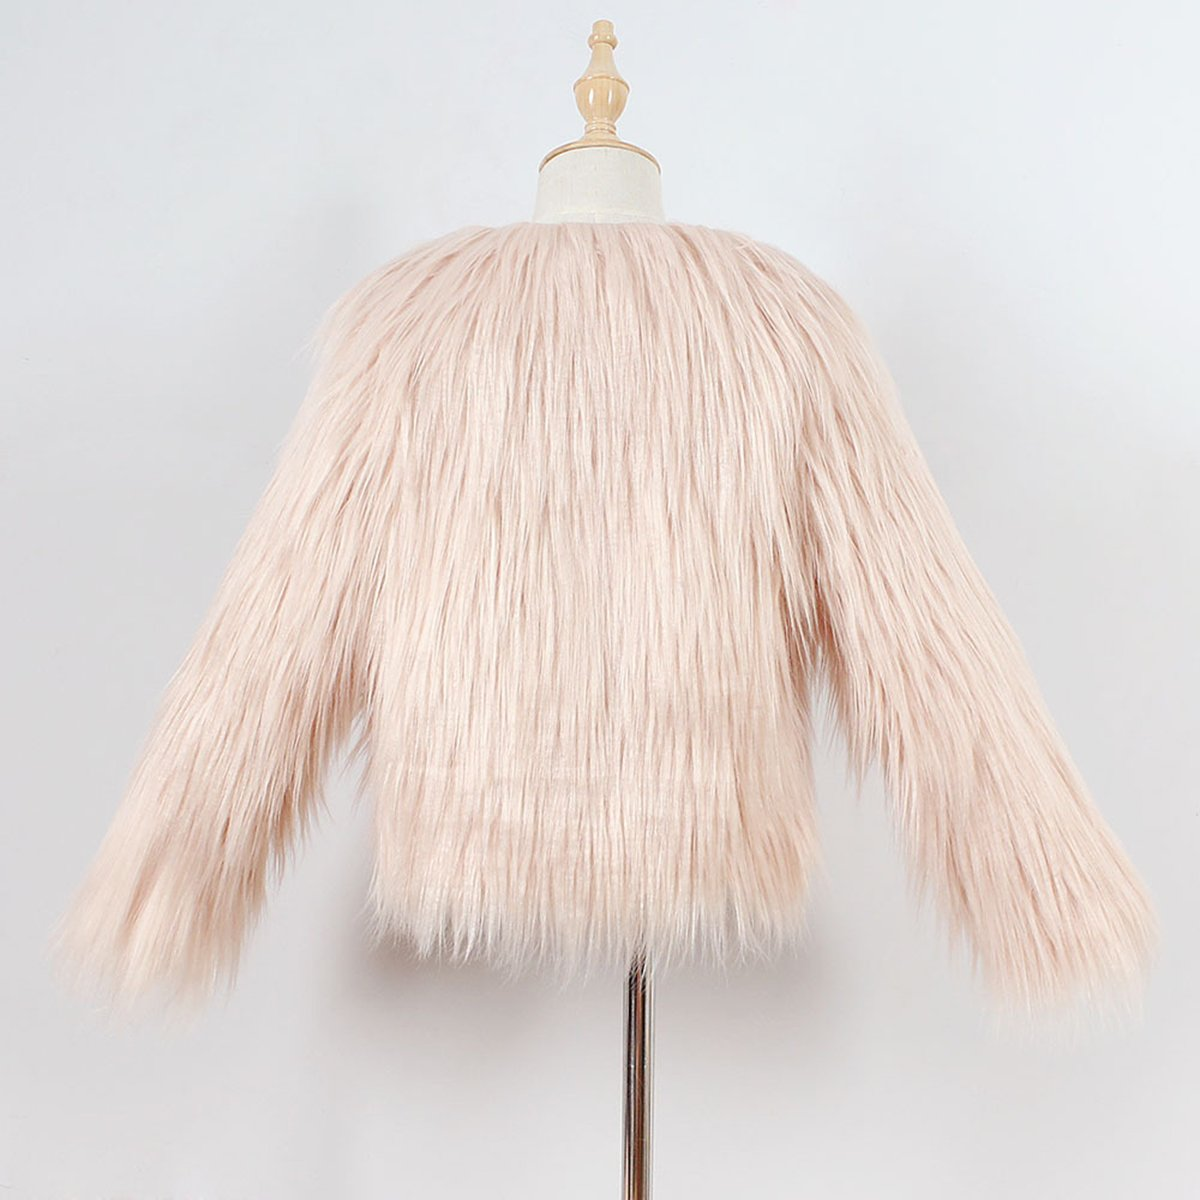 Girls Winter Round Neck Shaggy Faux Fur Coat Fuzzy Overcoat Jacket Outerwear for Little Kids